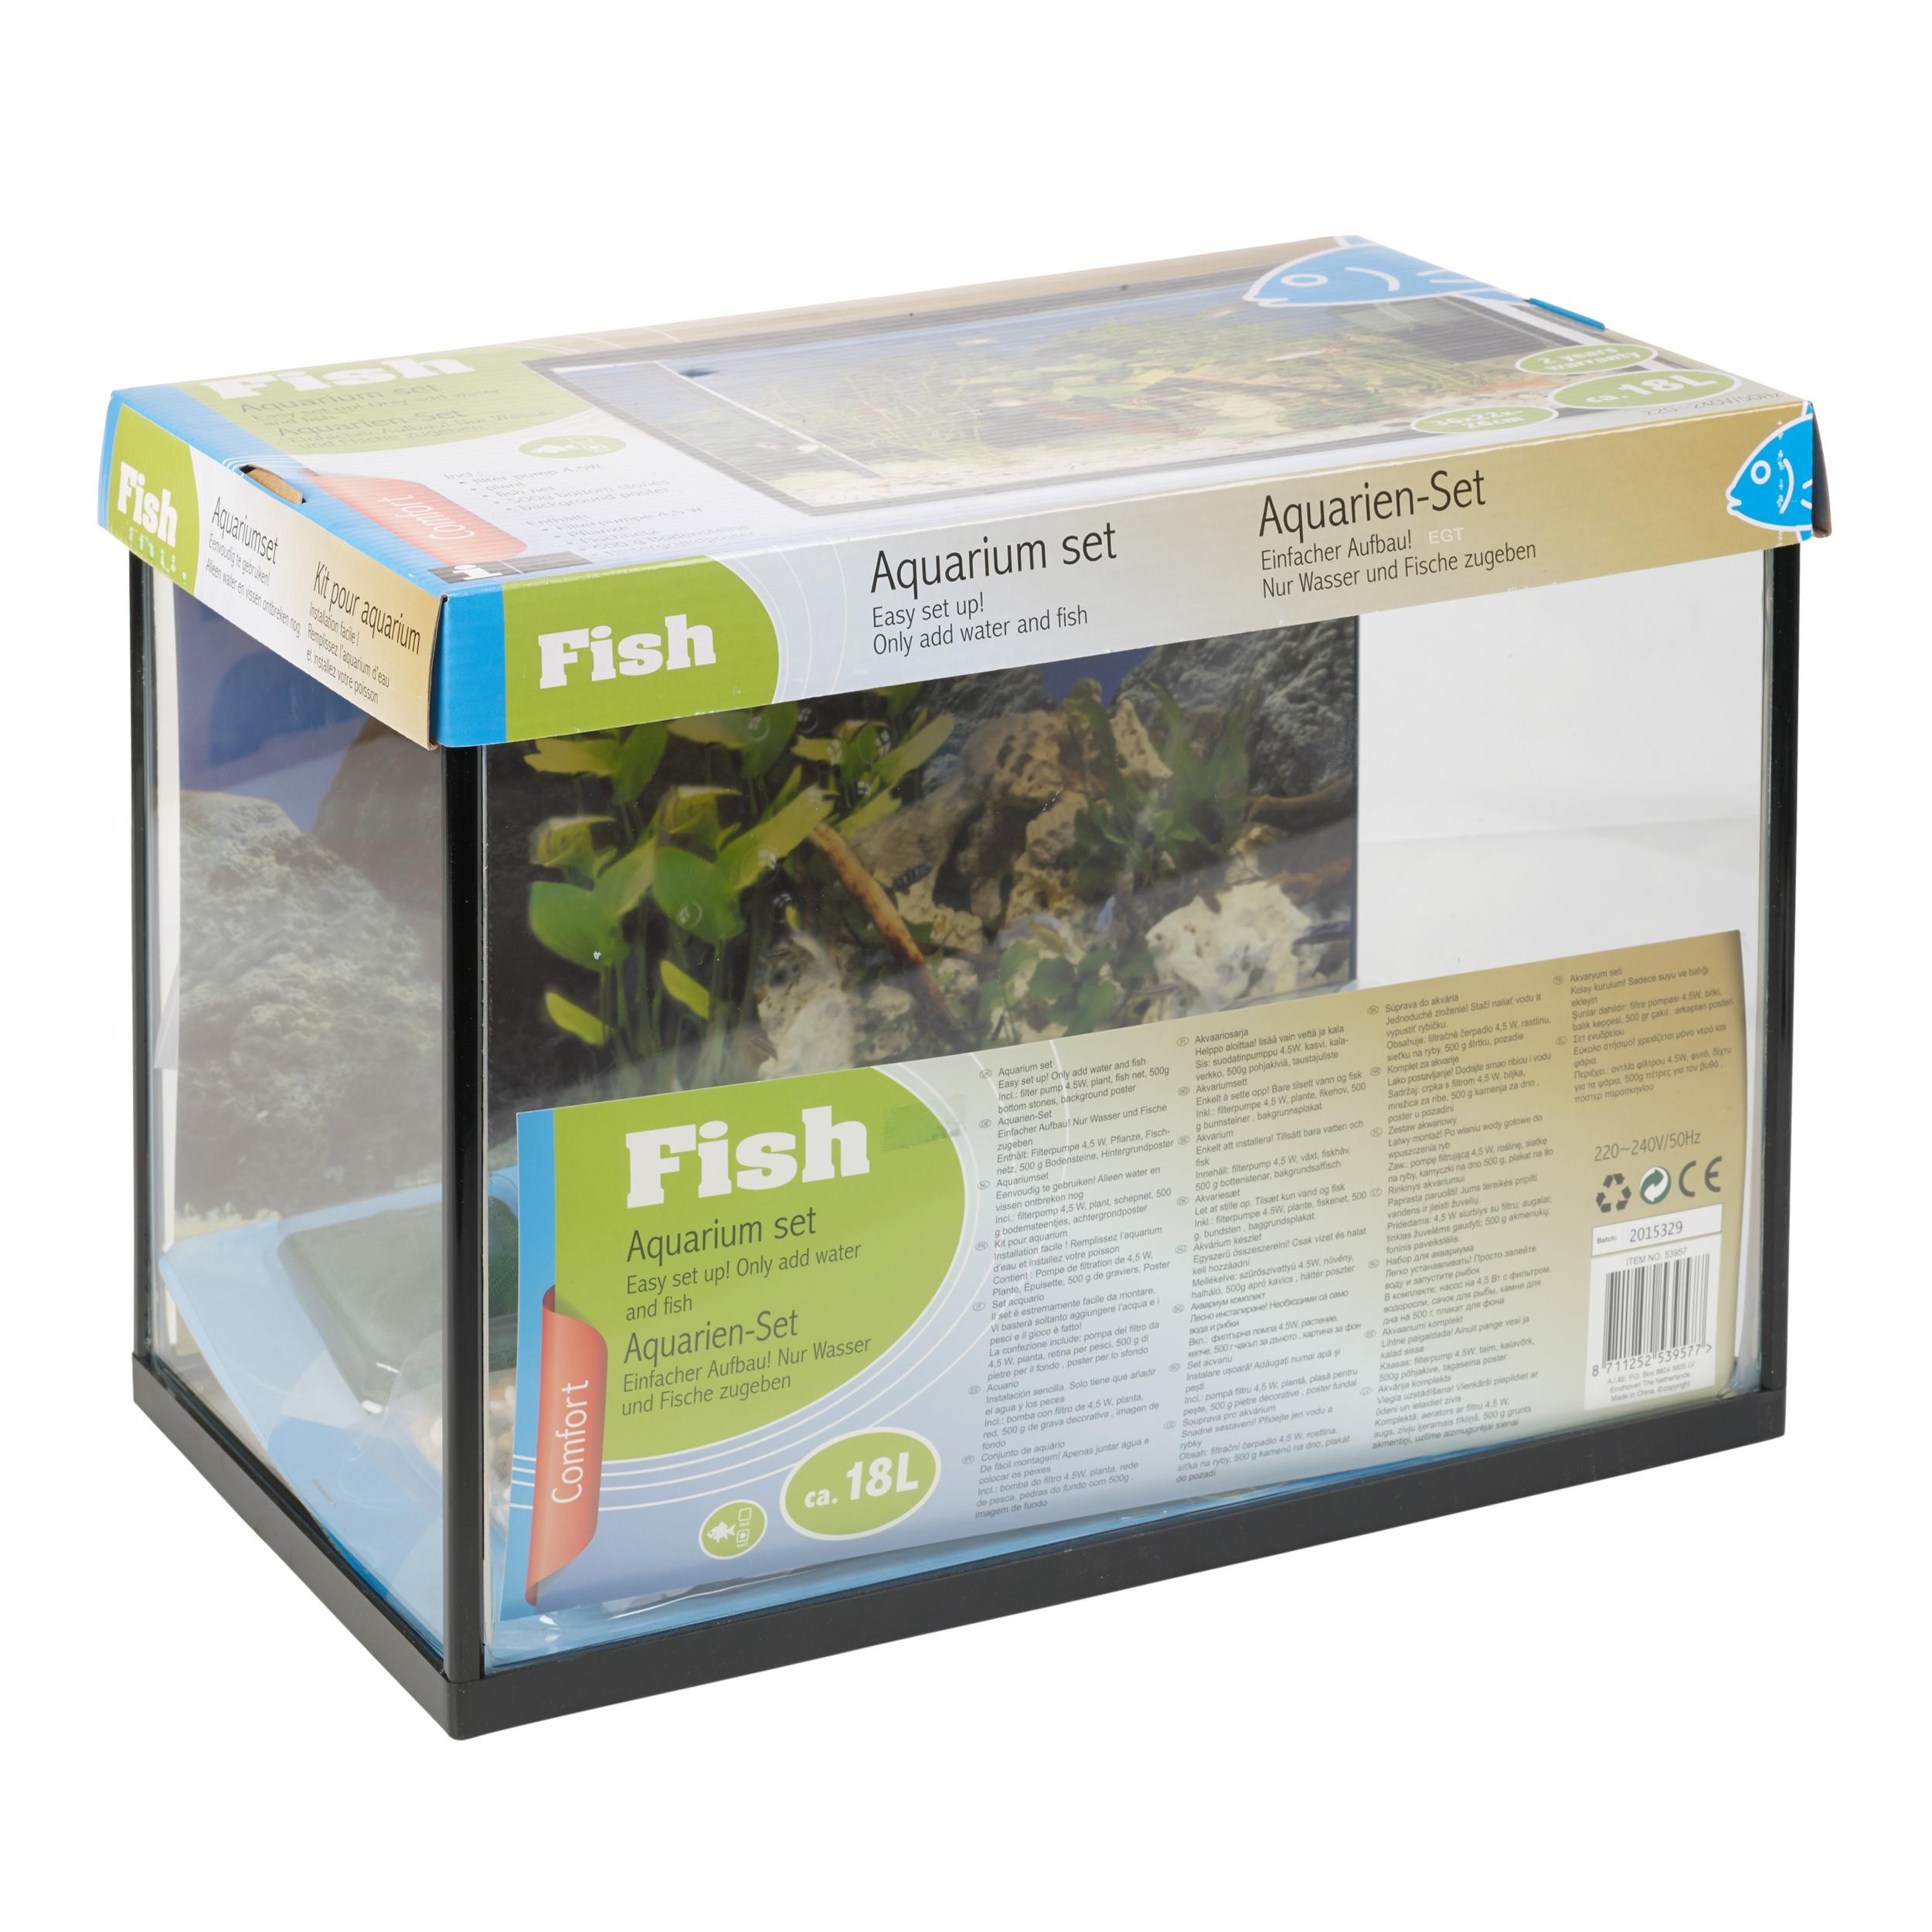 18 litre glass aquarium fish tank starter set with filter for Aquarium set